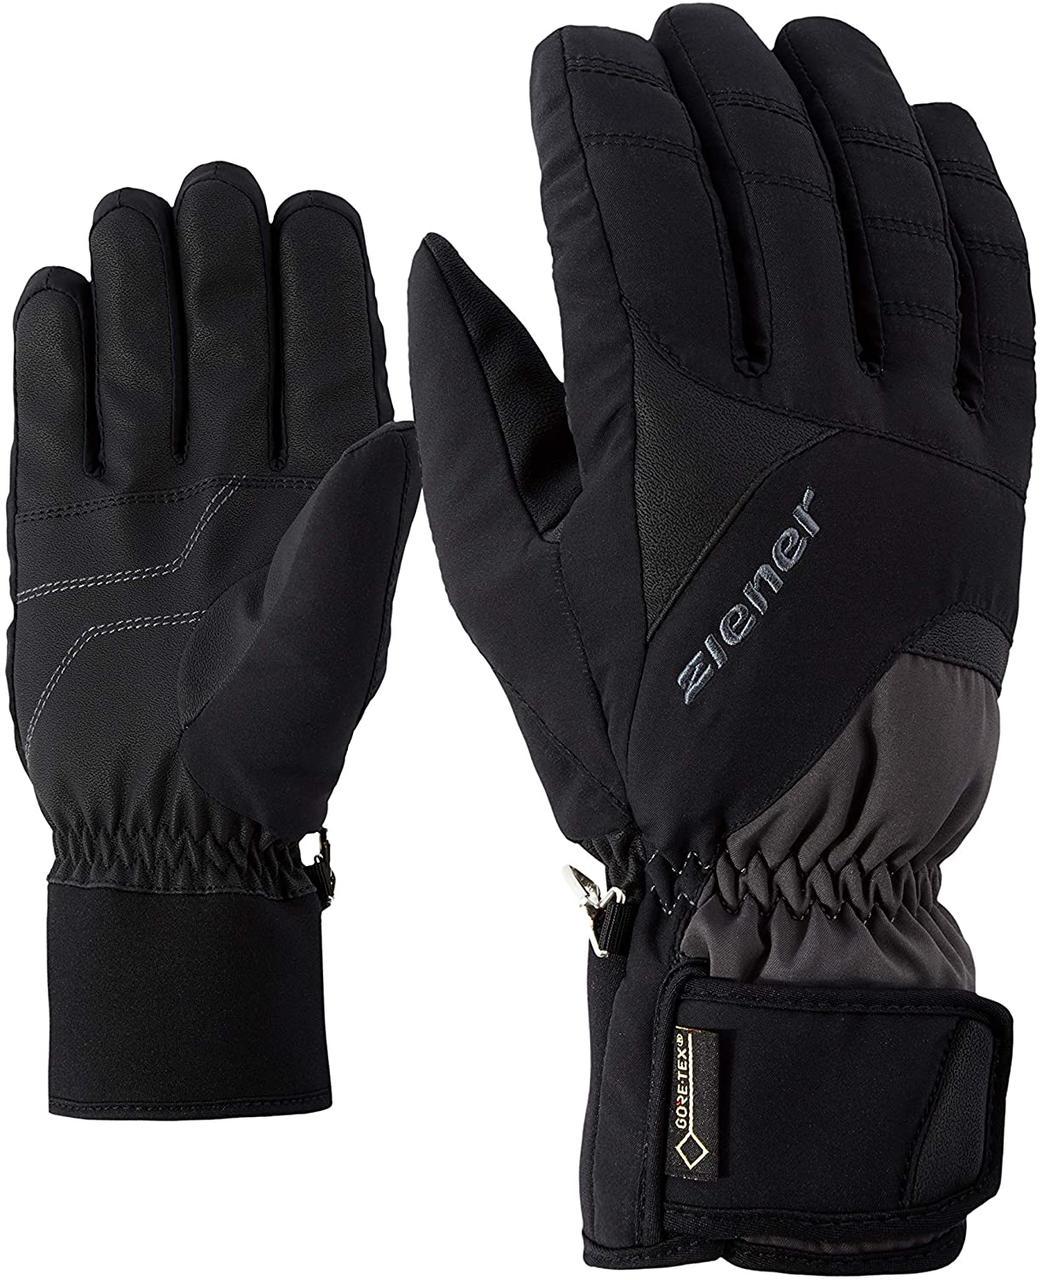 Гірськолижні рукавиці Ziener Erwachsene GUFFERT GTX   10.5(XL)